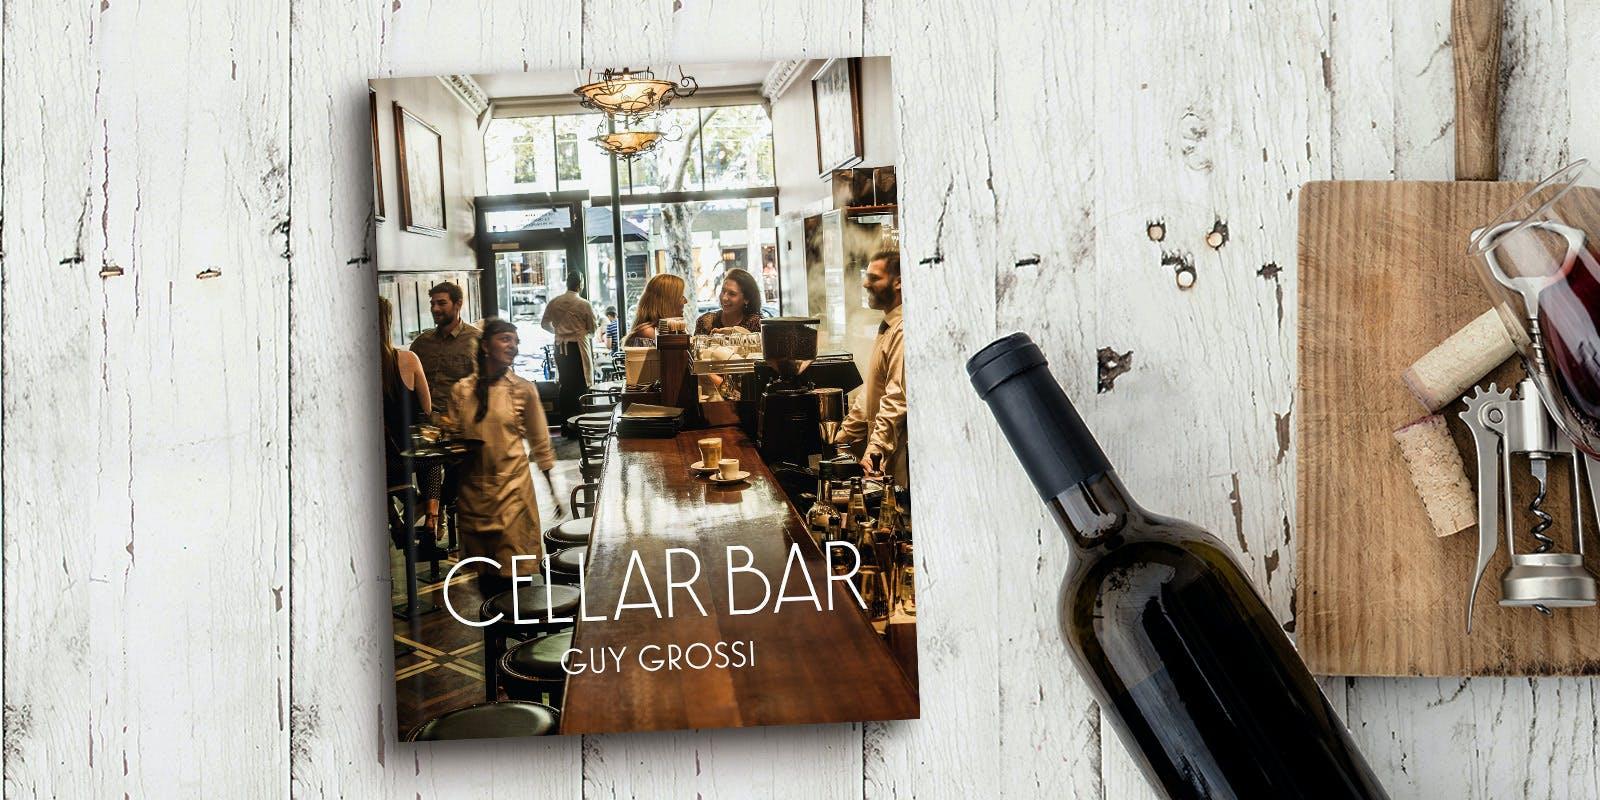 Cellar Bar: a history